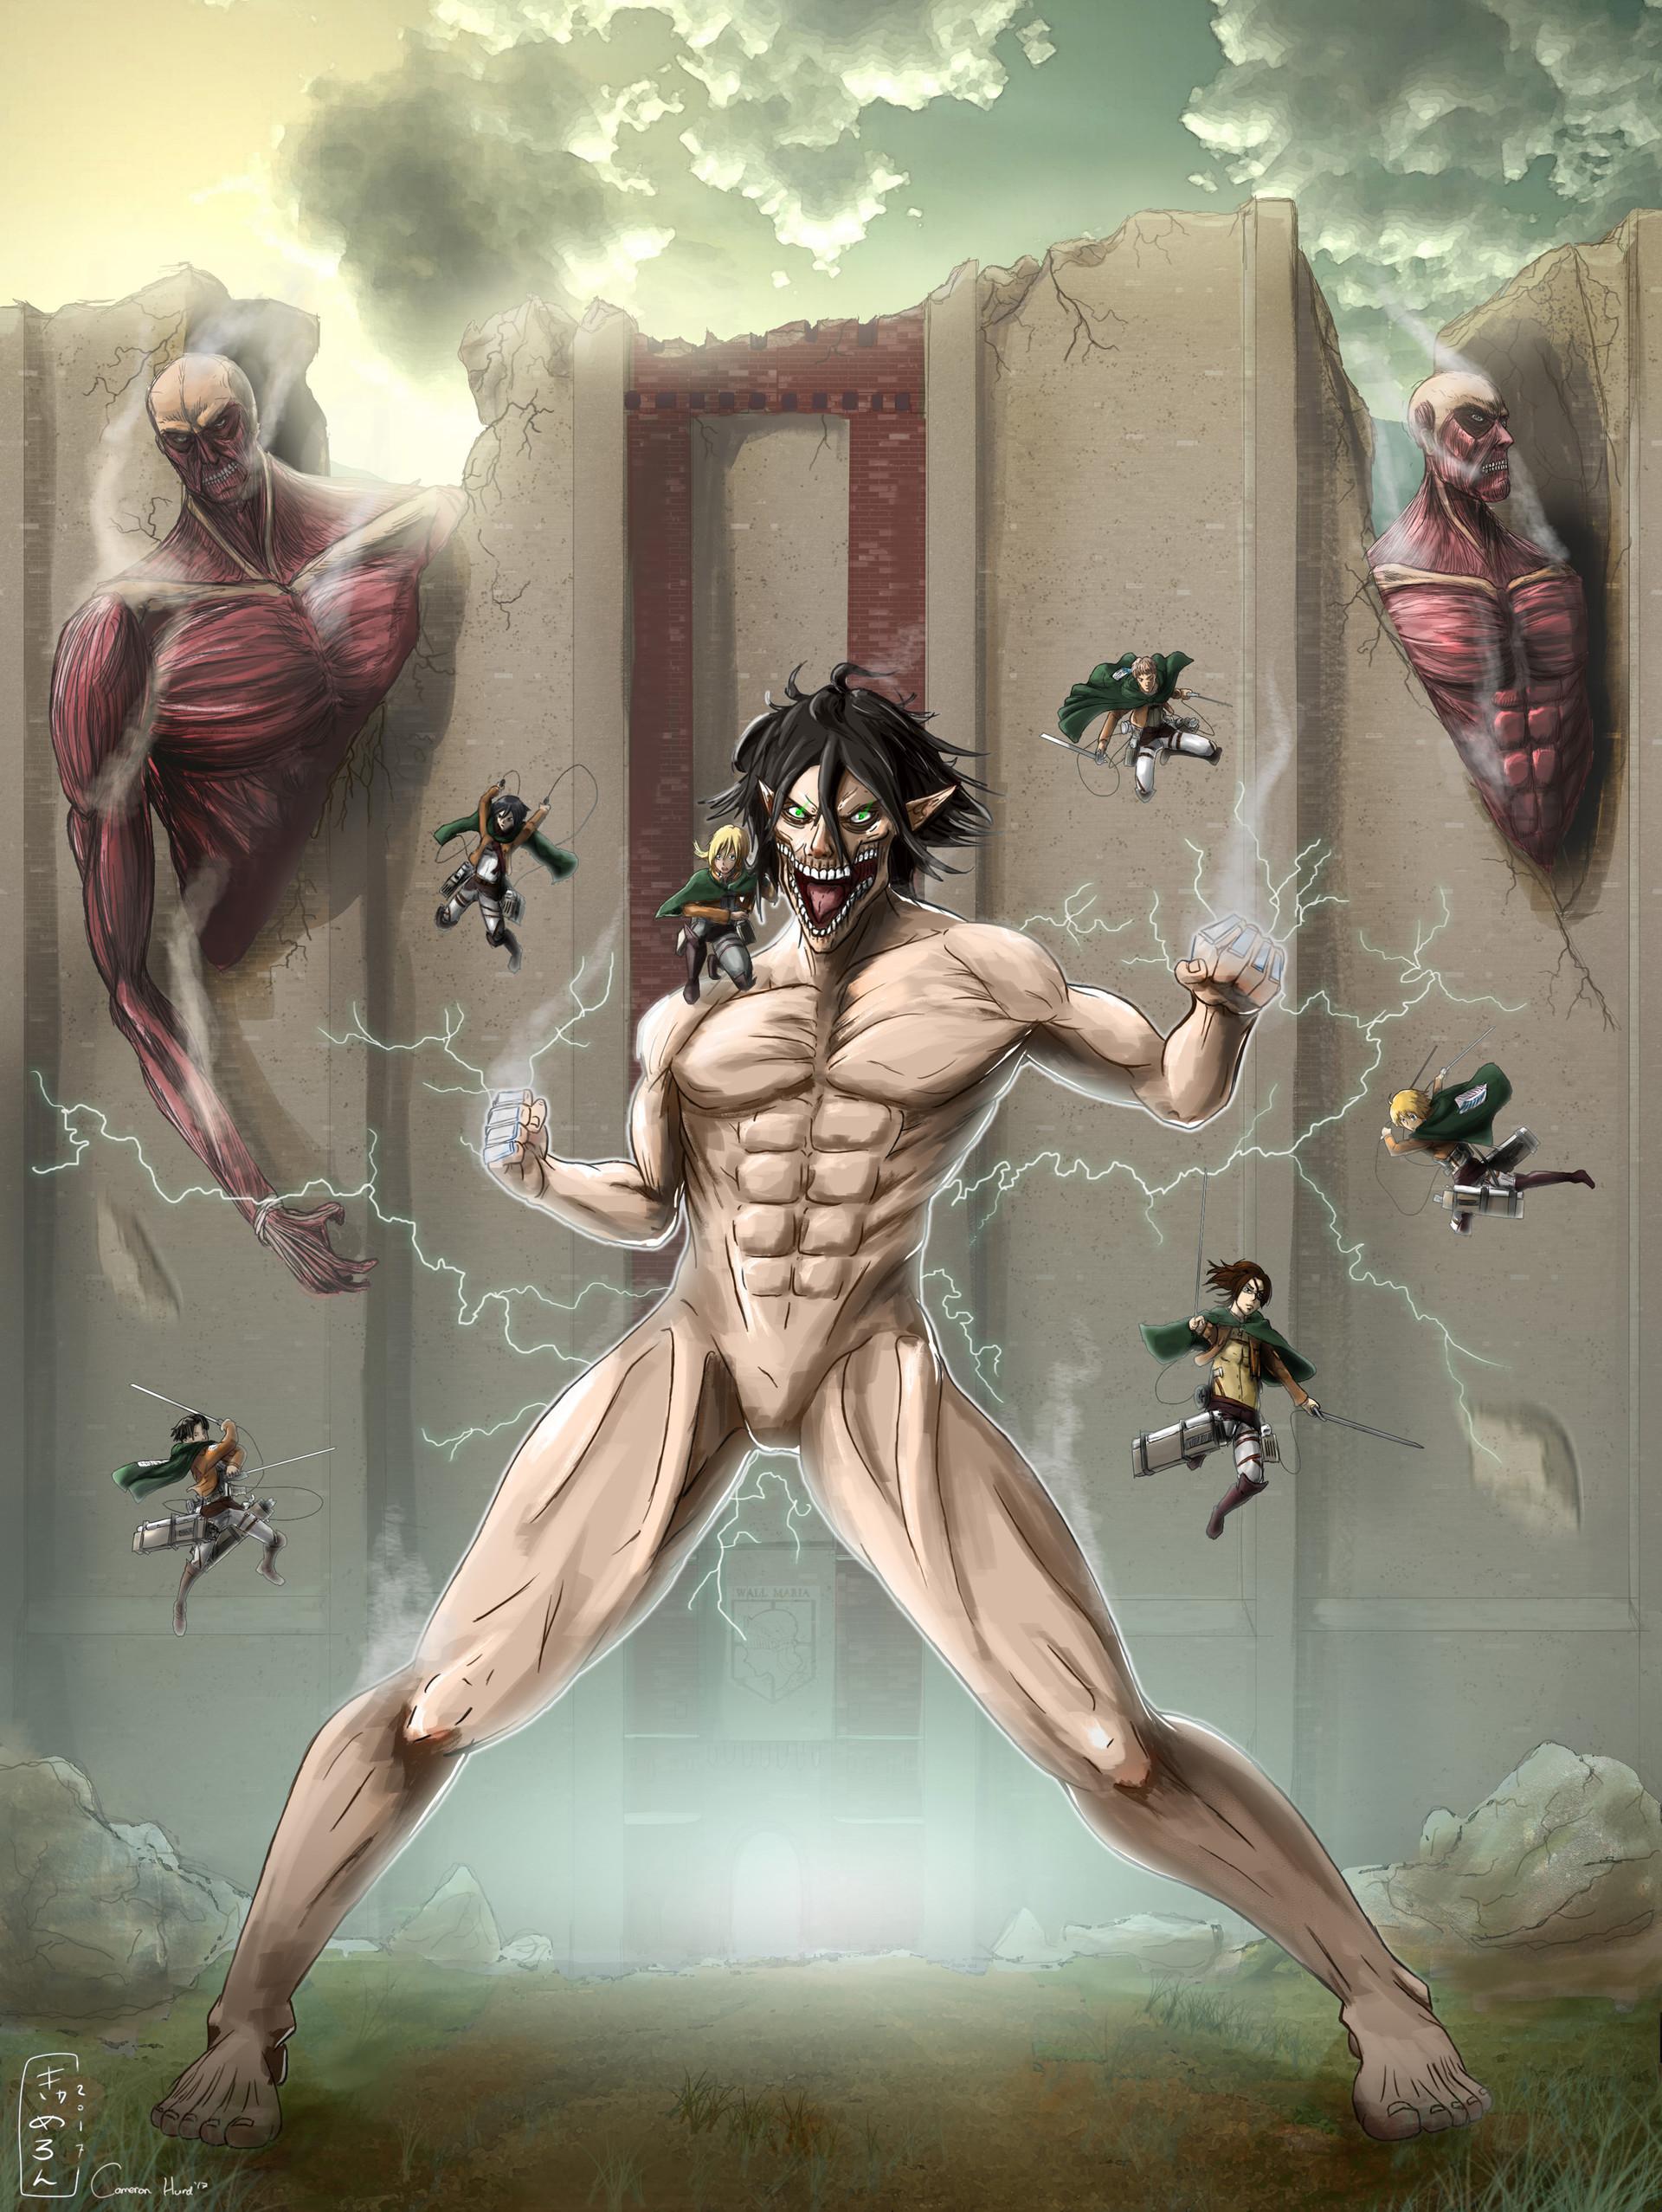 Cameron Hurd - Attack On Titan FanArt